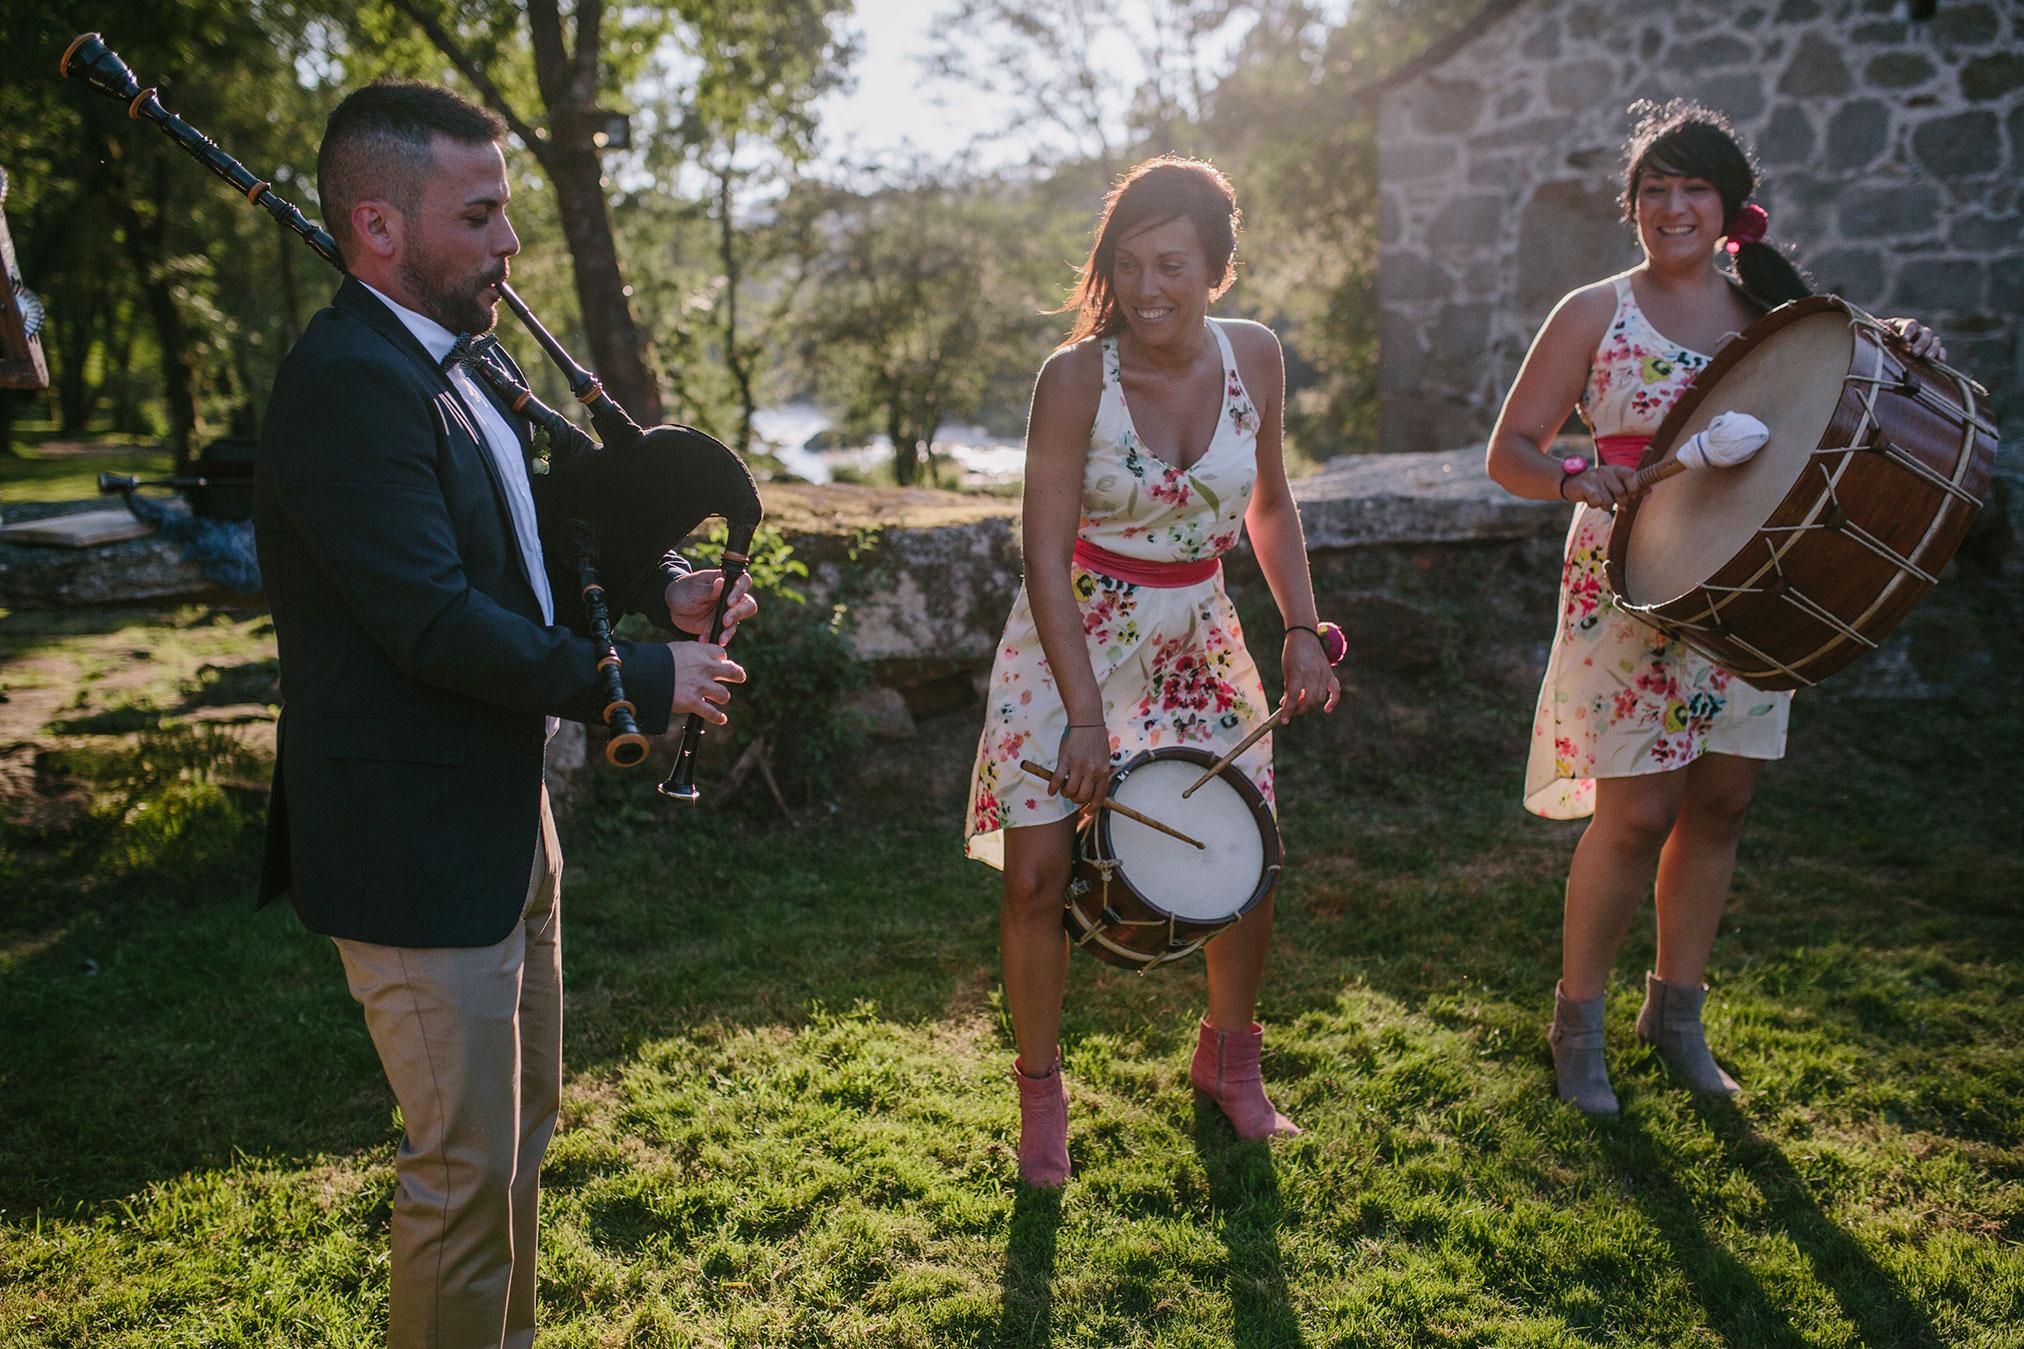 Wedding Photographer Graciela Vilagudin Dublin Galicia 841.jpg